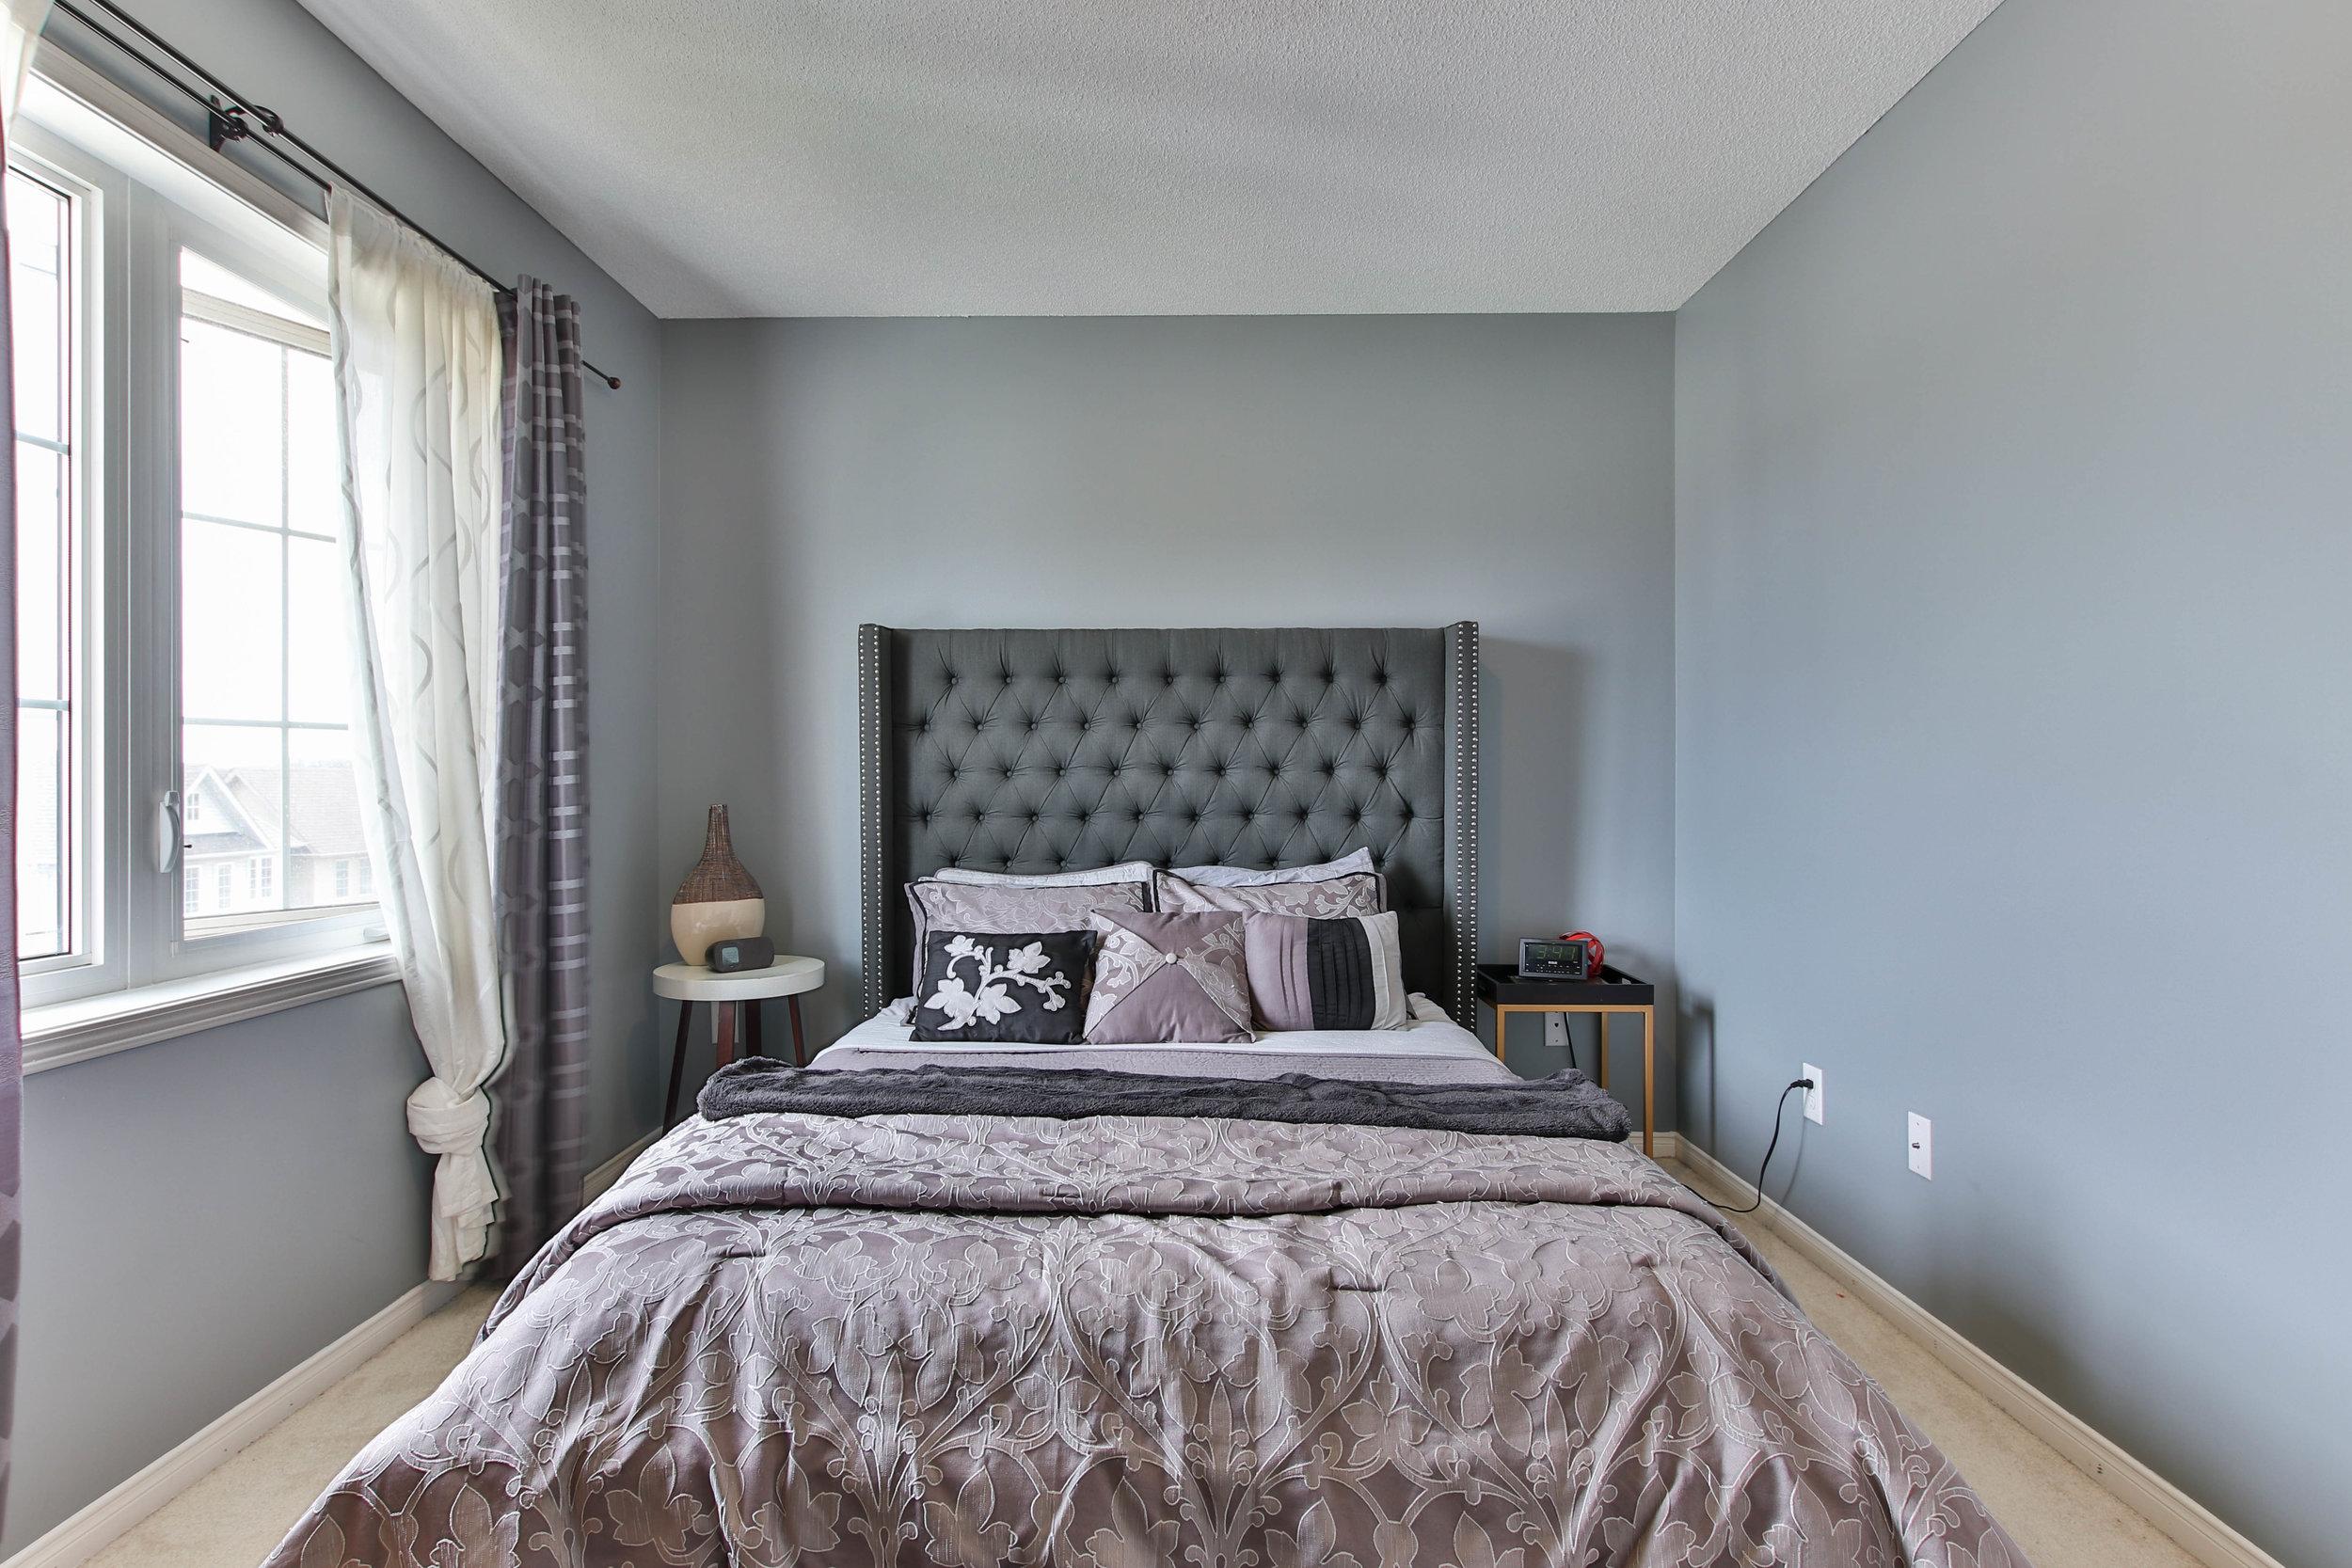 20_Bedroom (1 of 1).jpg